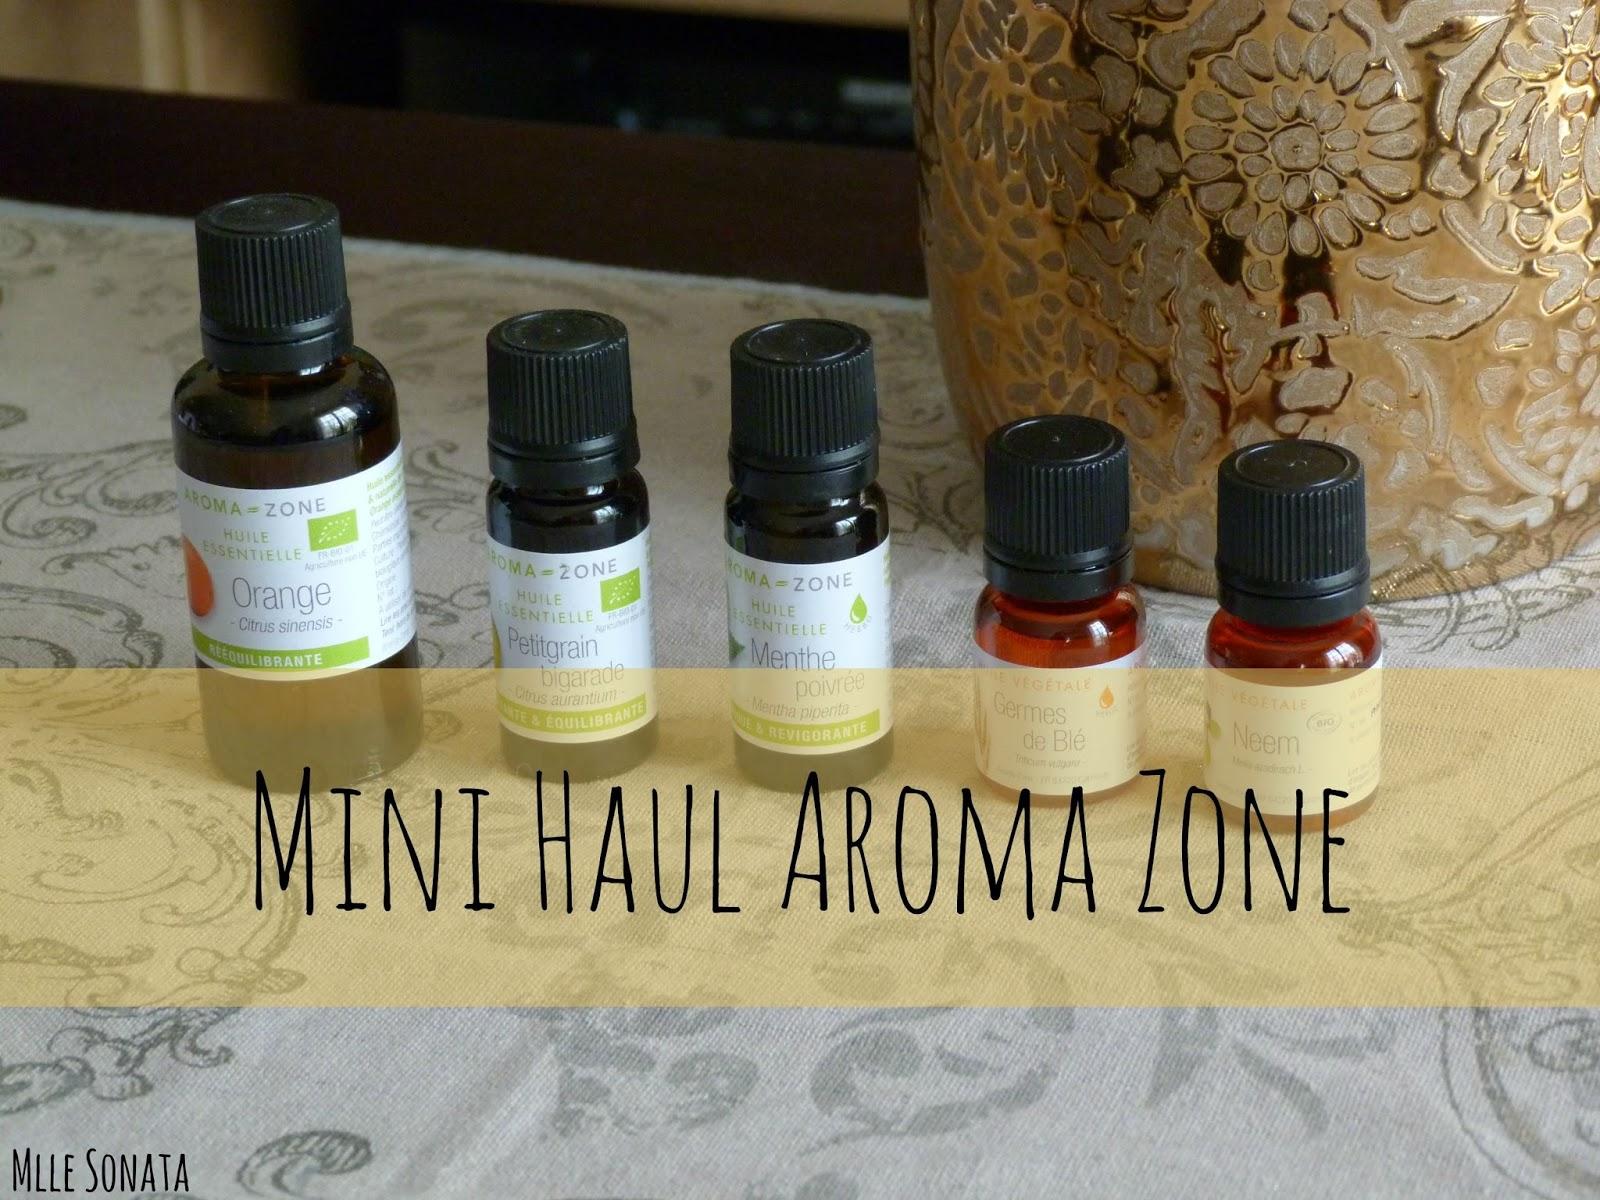 haul aroma zone huiles essentielles et v g tales. Black Bedroom Furniture Sets. Home Design Ideas